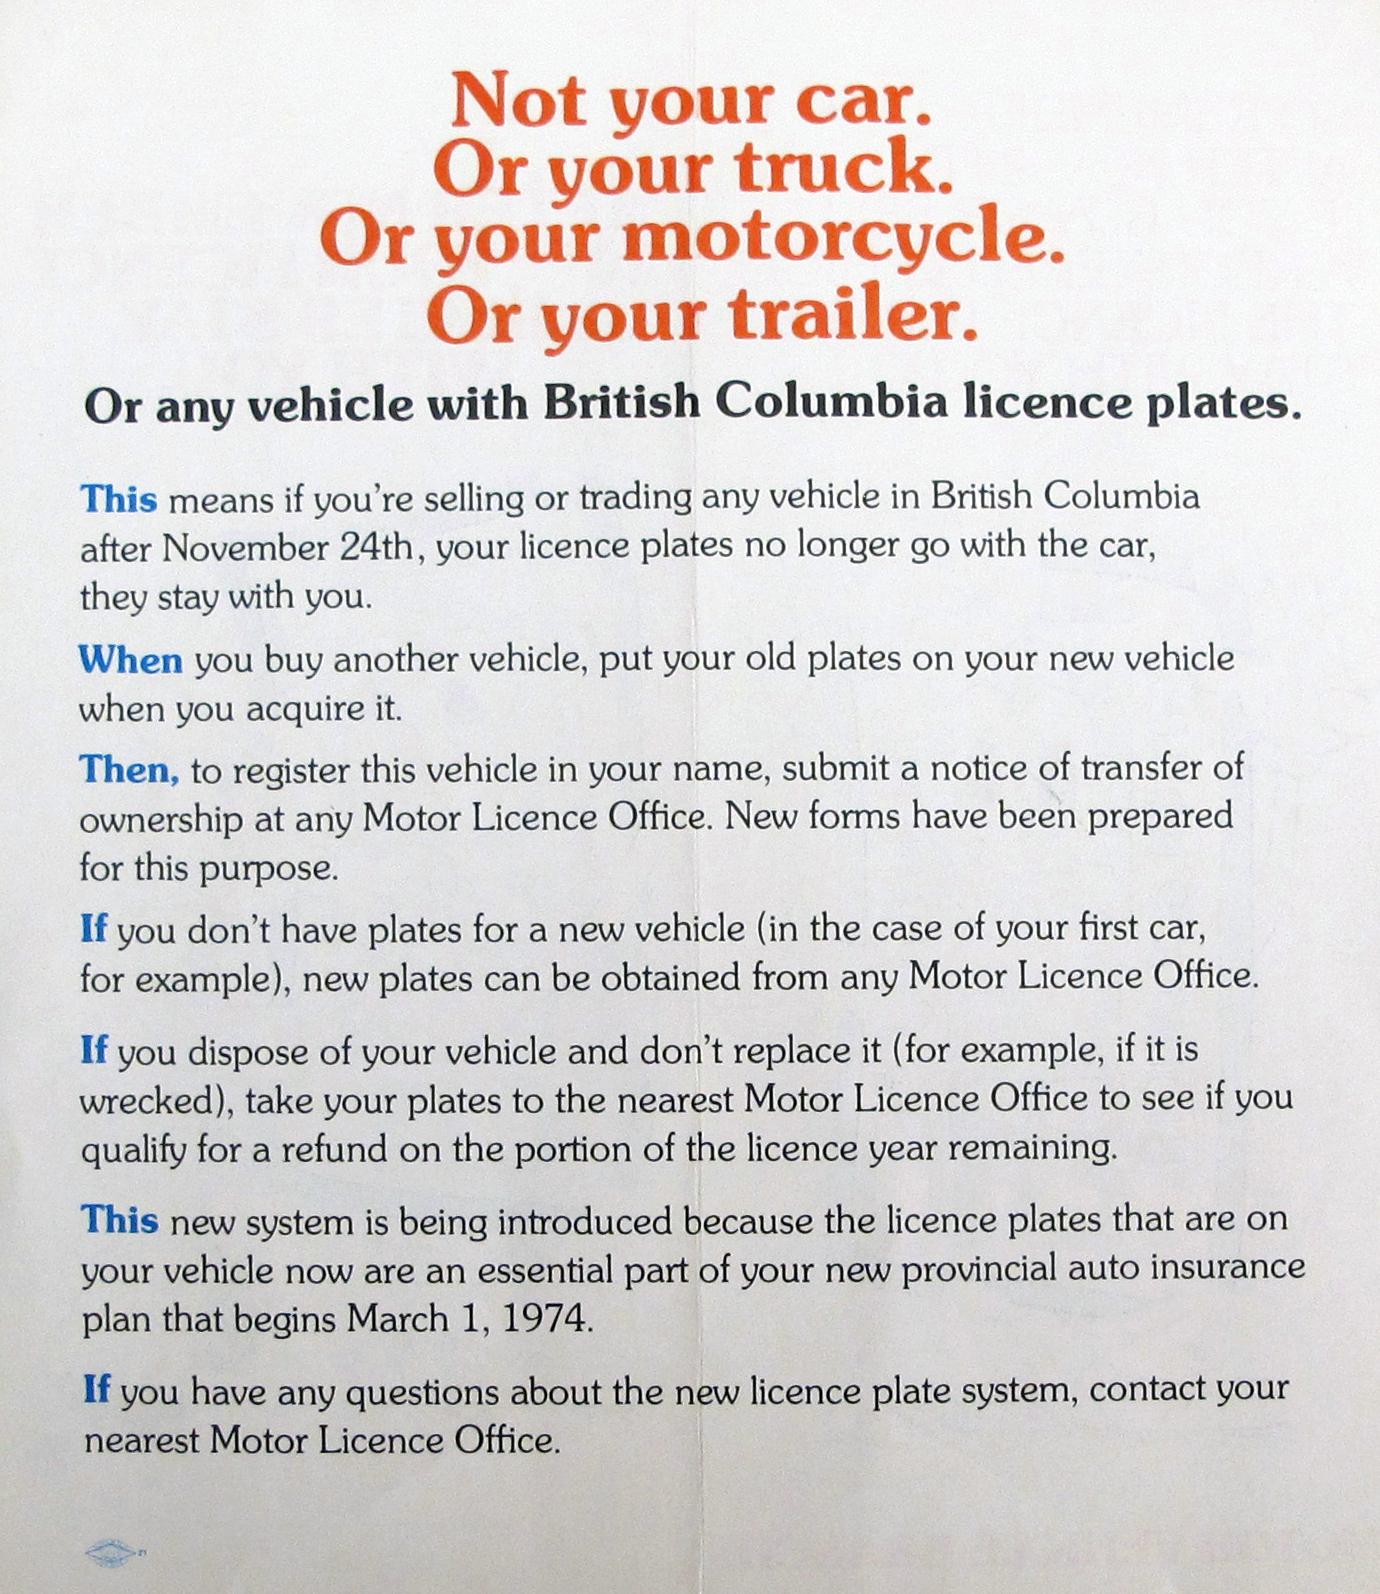 British Columbia Temporary Operating Permits